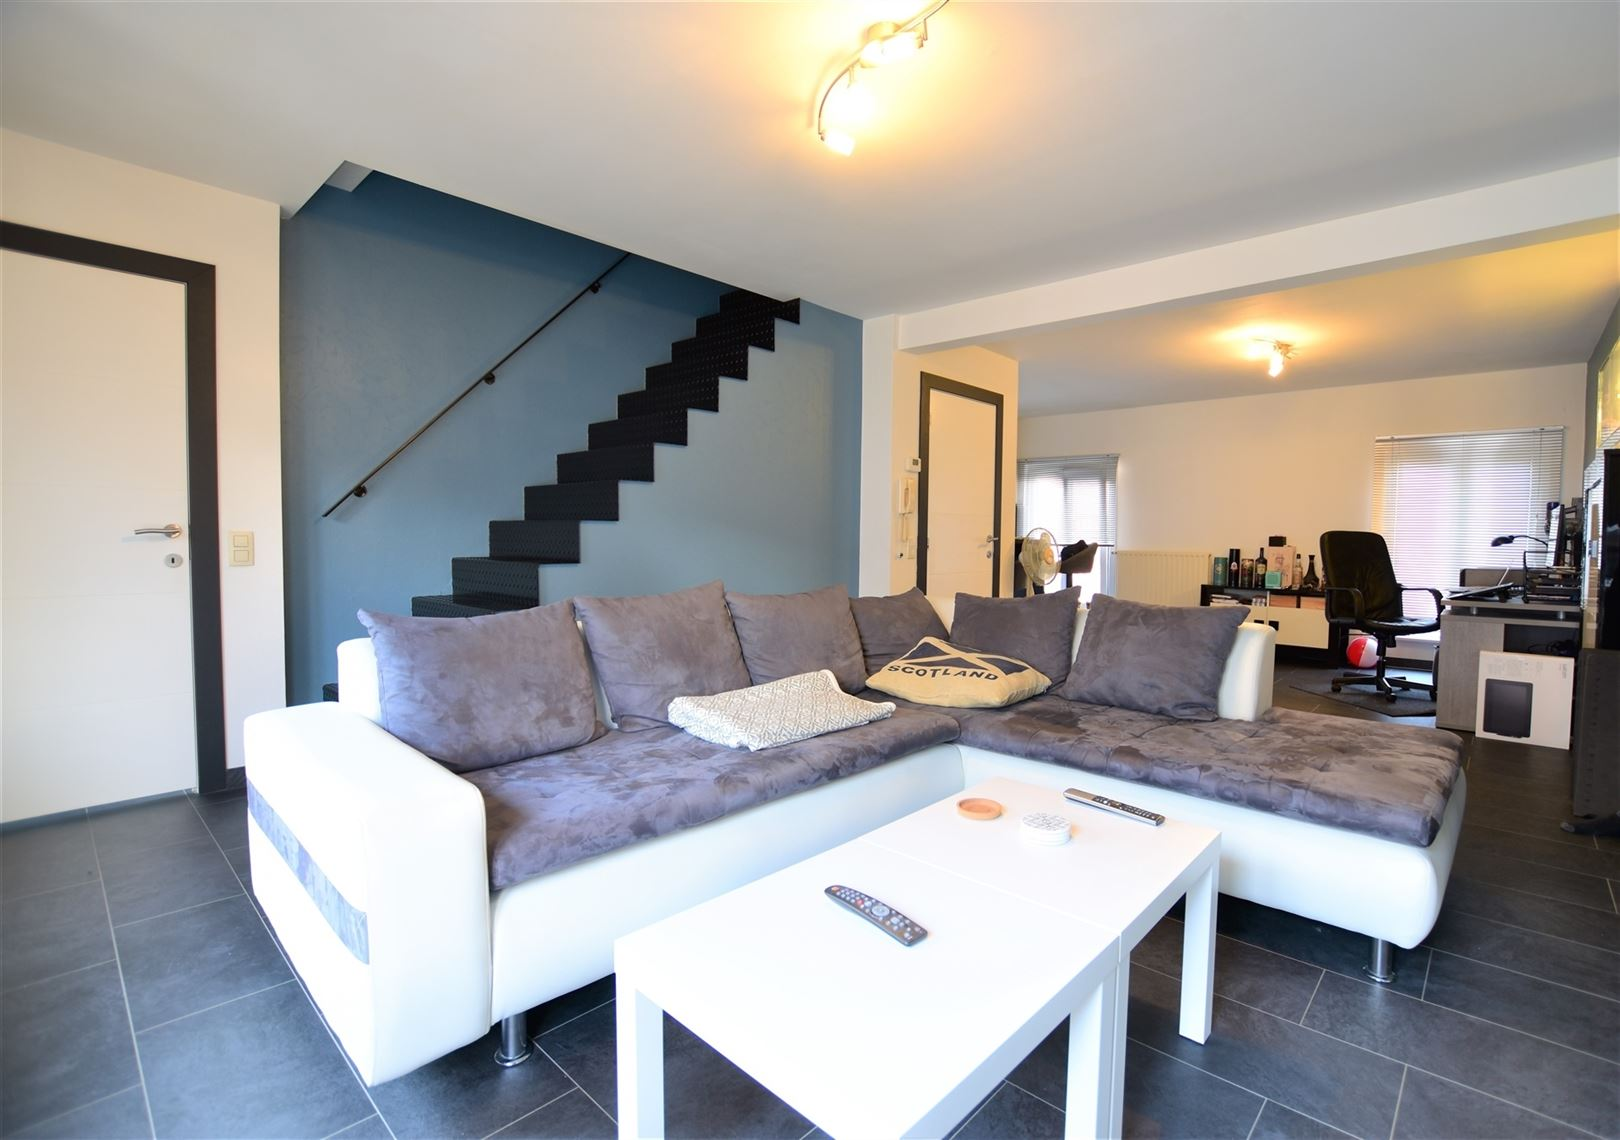 Foto 1 : Duplex/triplex te 9200 BAASRODE (België) - Prijs € 159.000